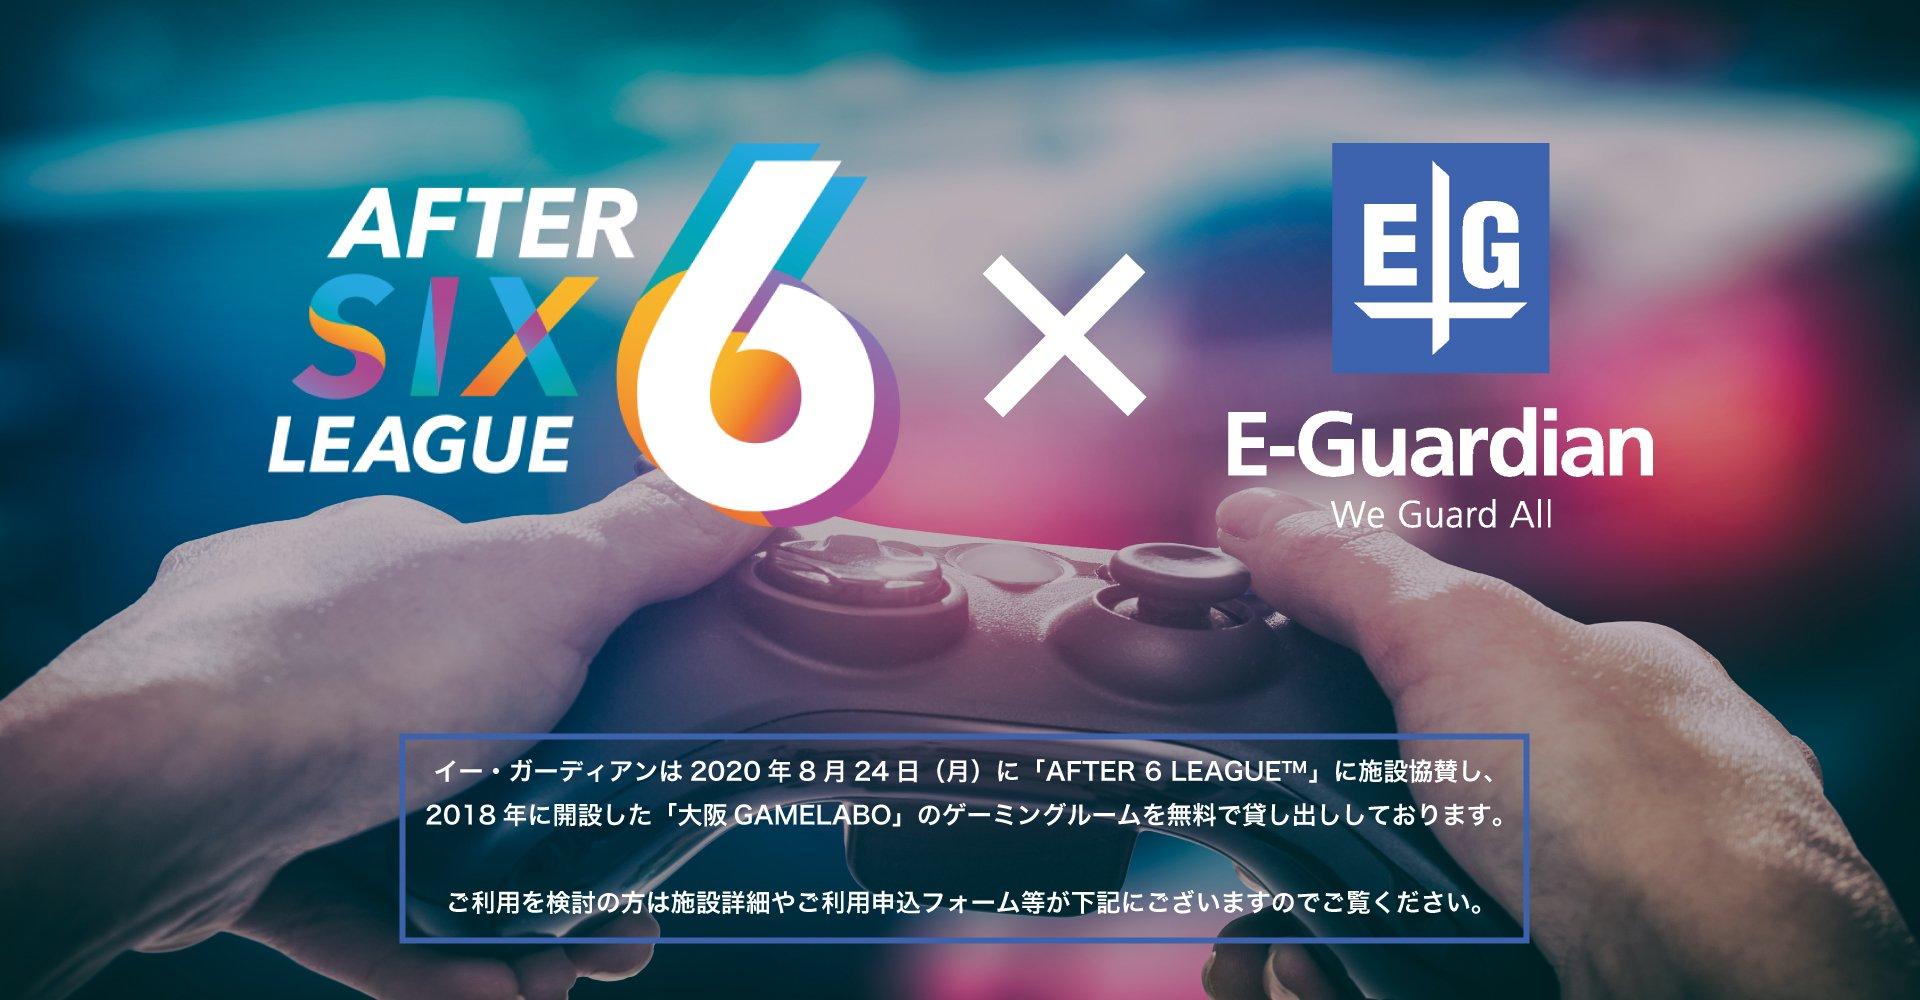 GL-a6l-top-2.jpg